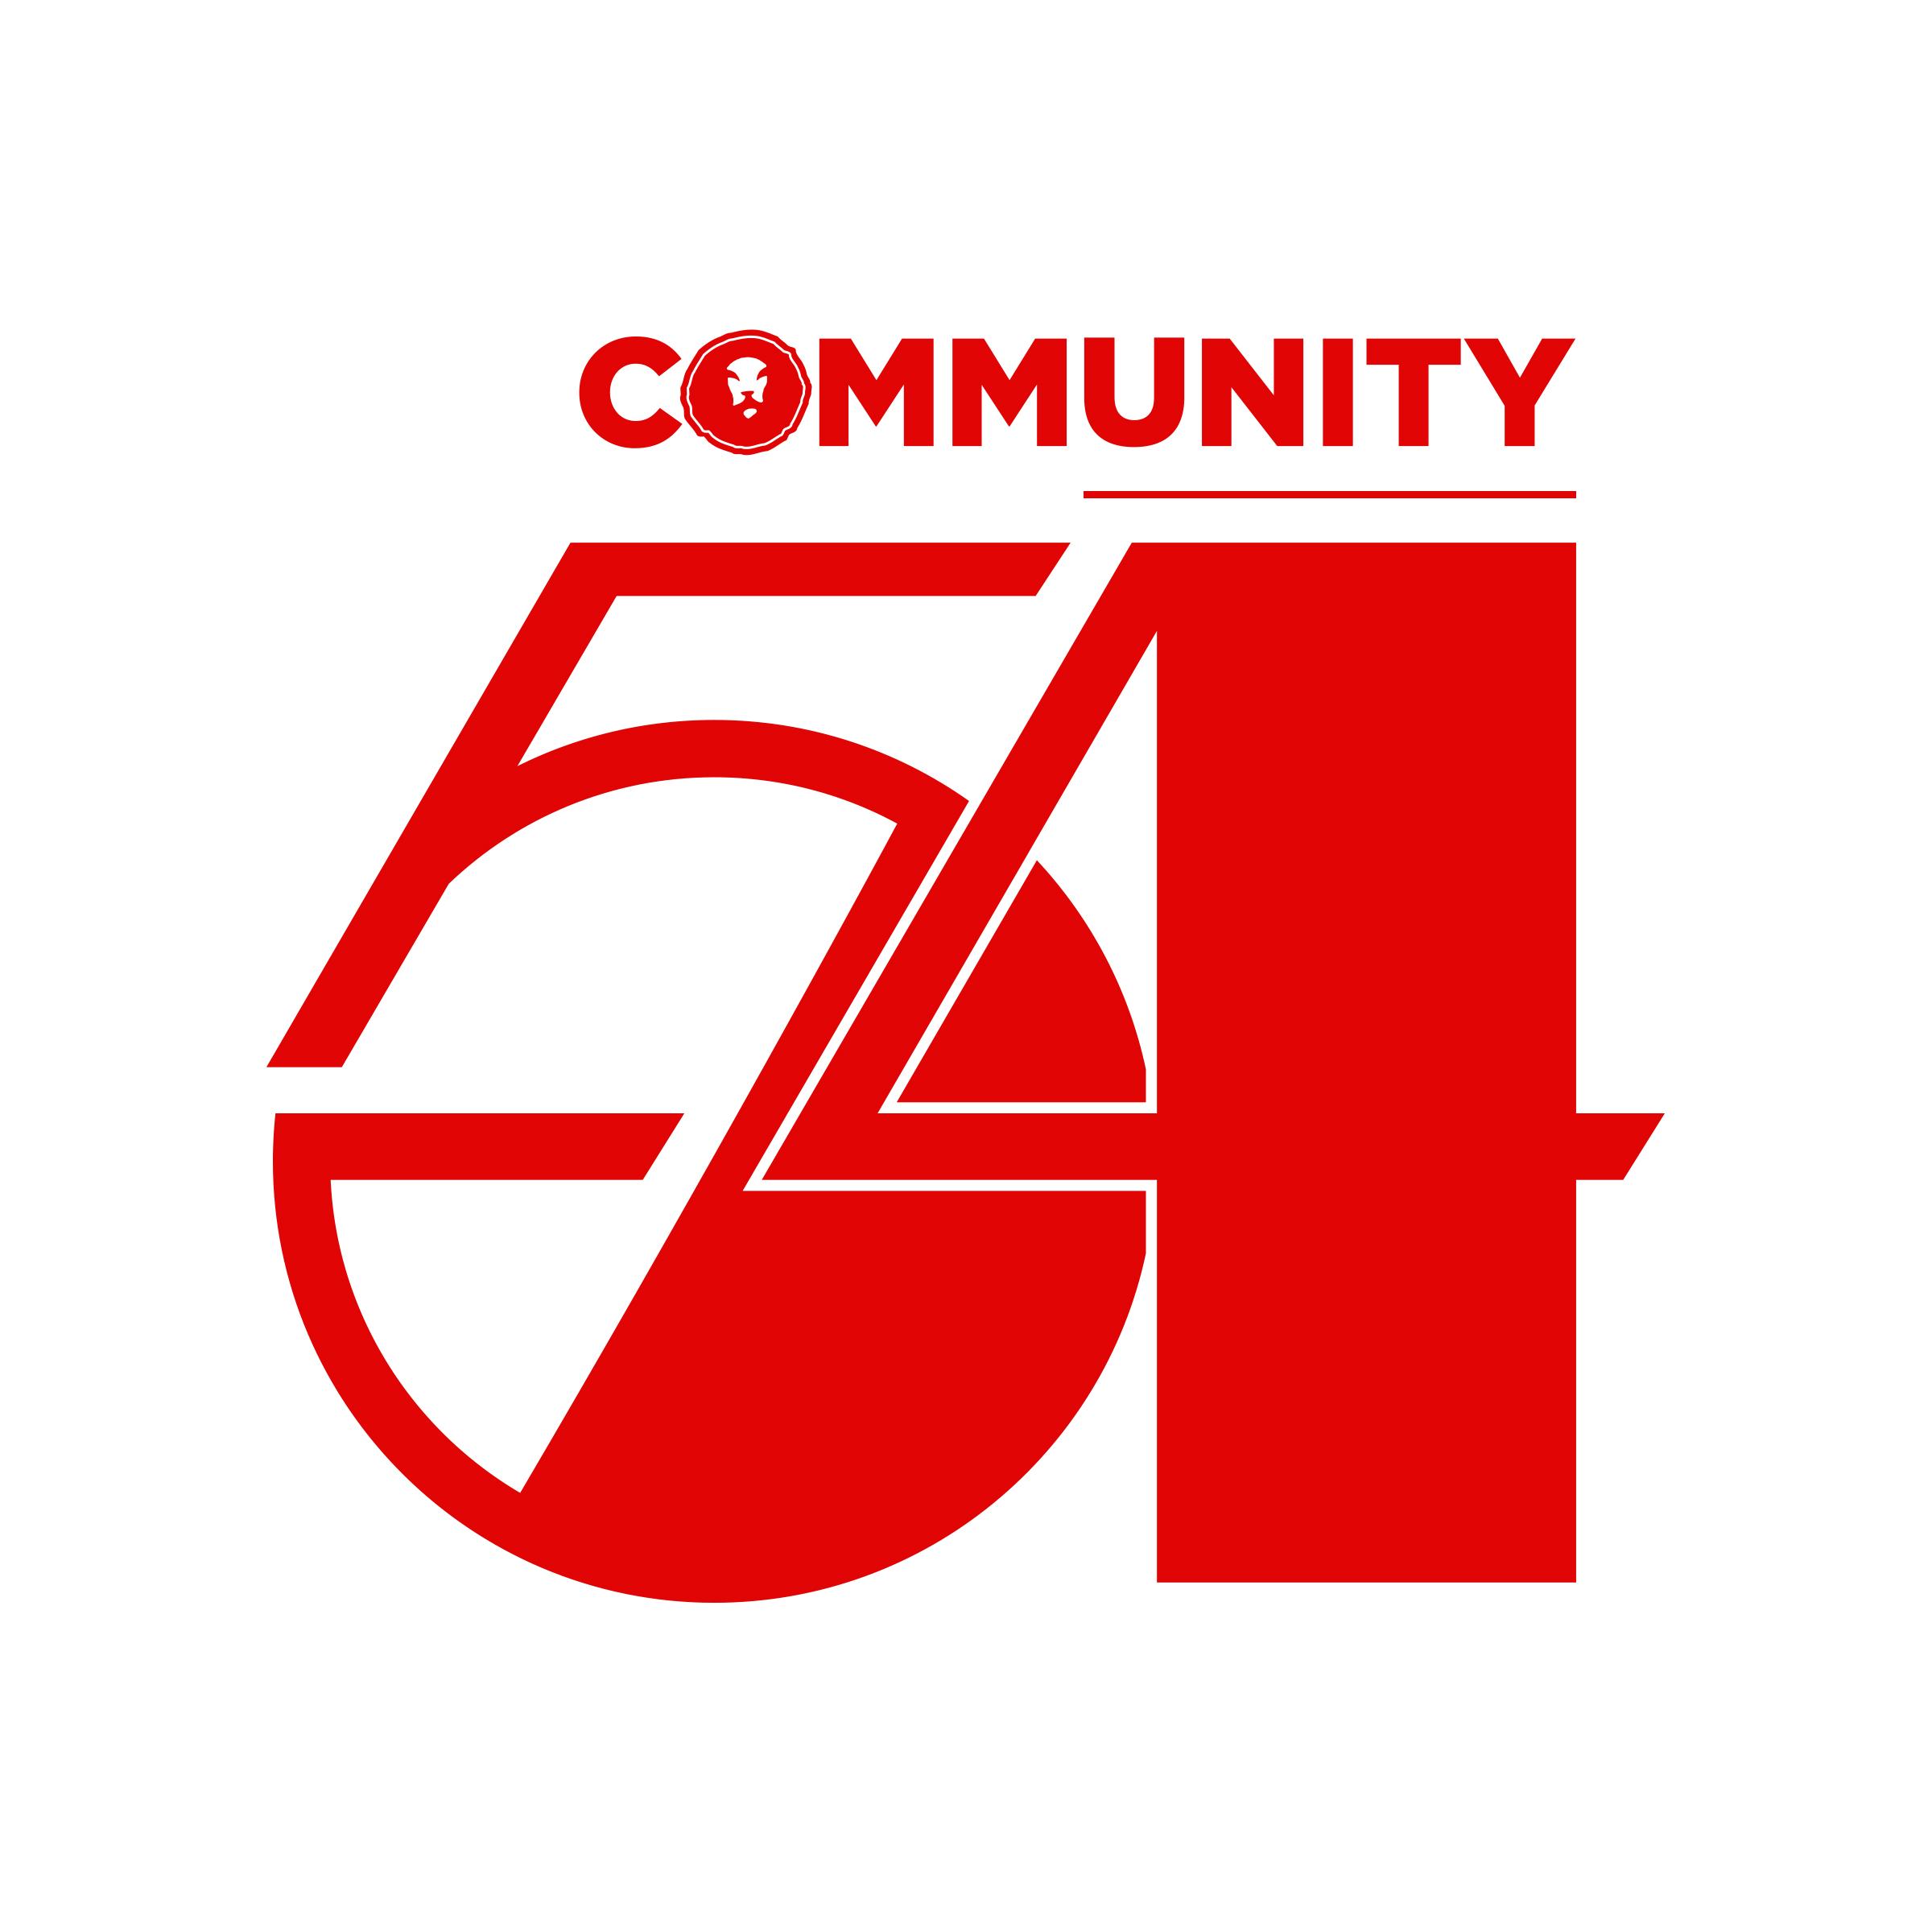 c54 logo vector copy.jpg